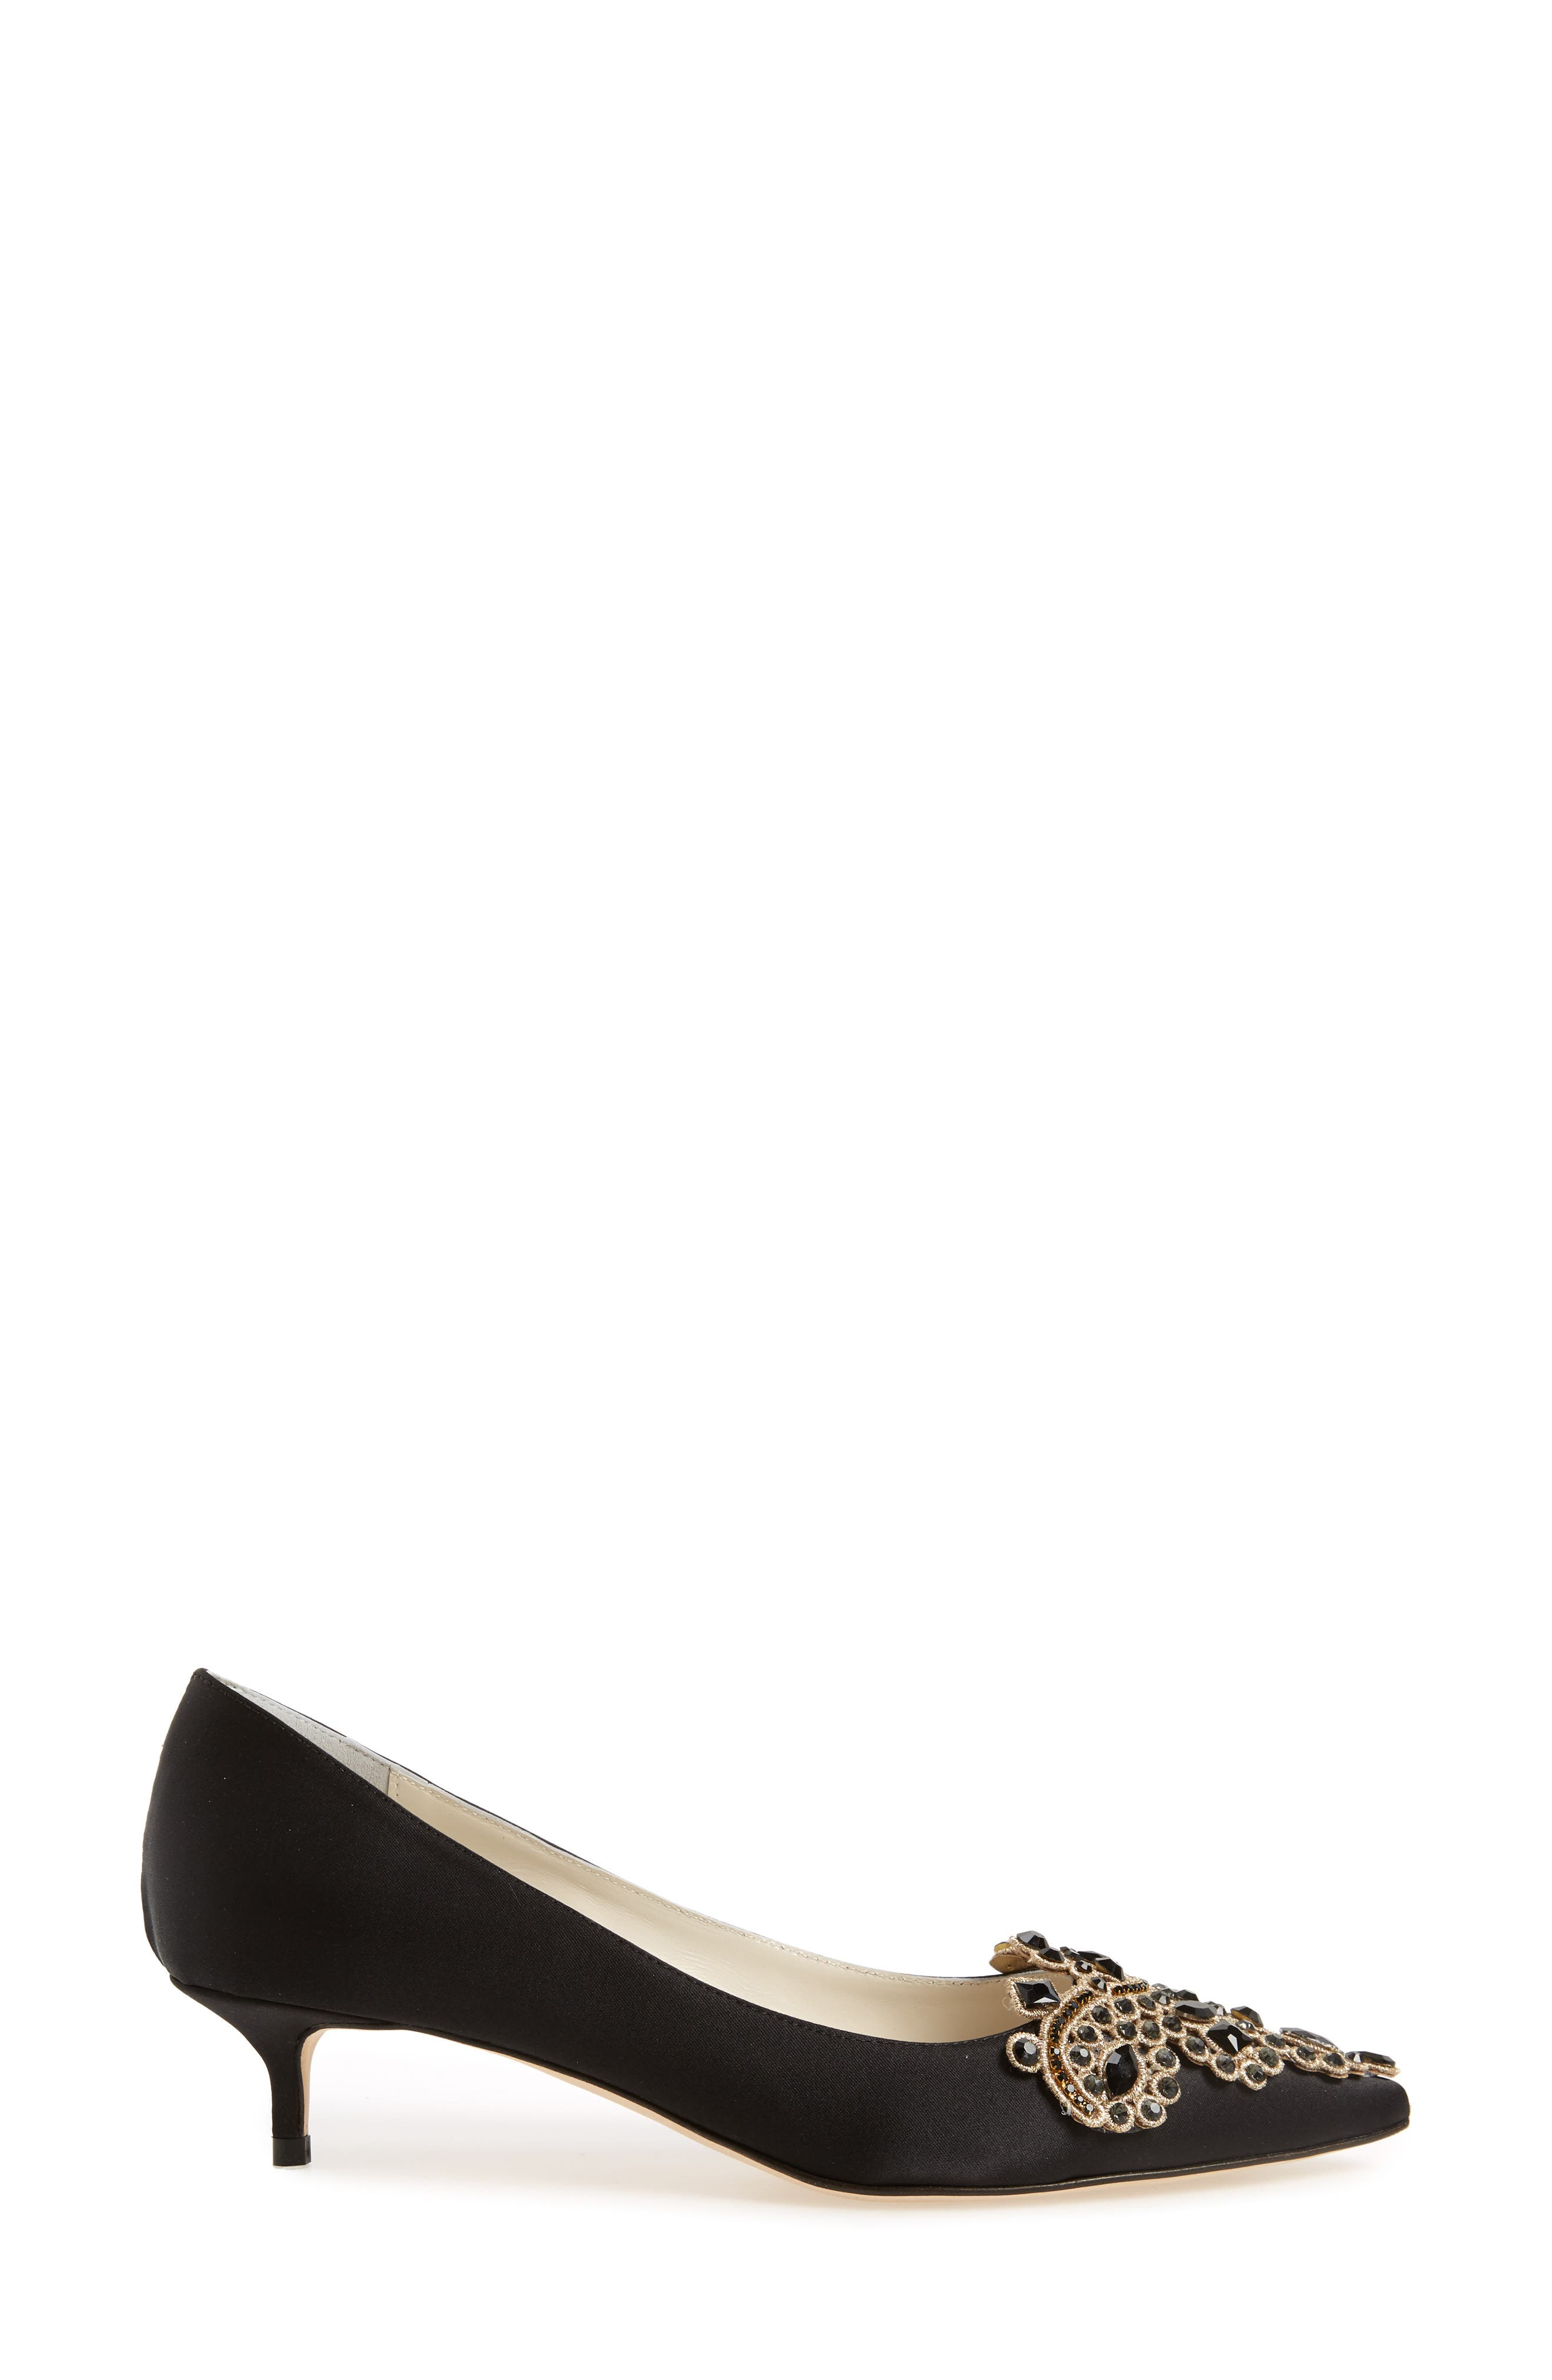 Brinsley Embellished Pointy Toe Pump,                             Alternate thumbnail 3, color,                             BLACK SATIN